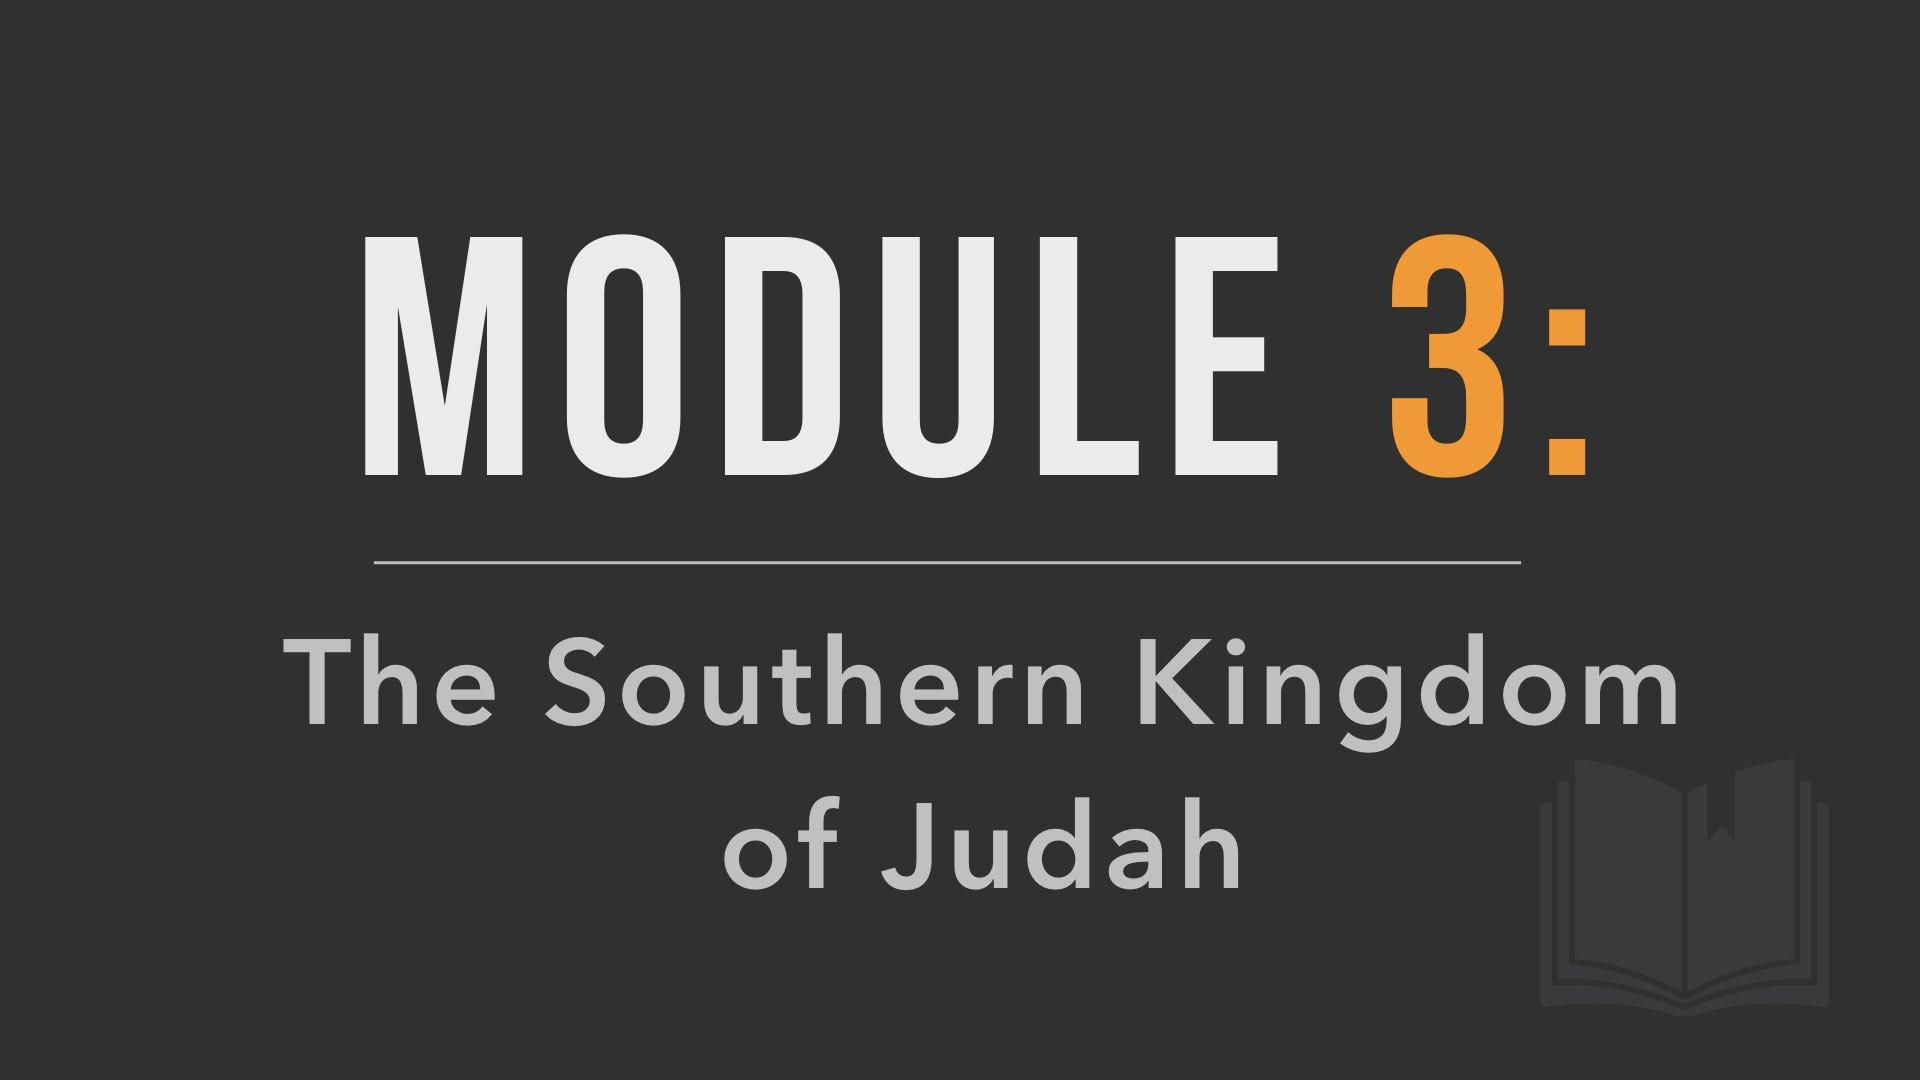 Module 3 Poster Image